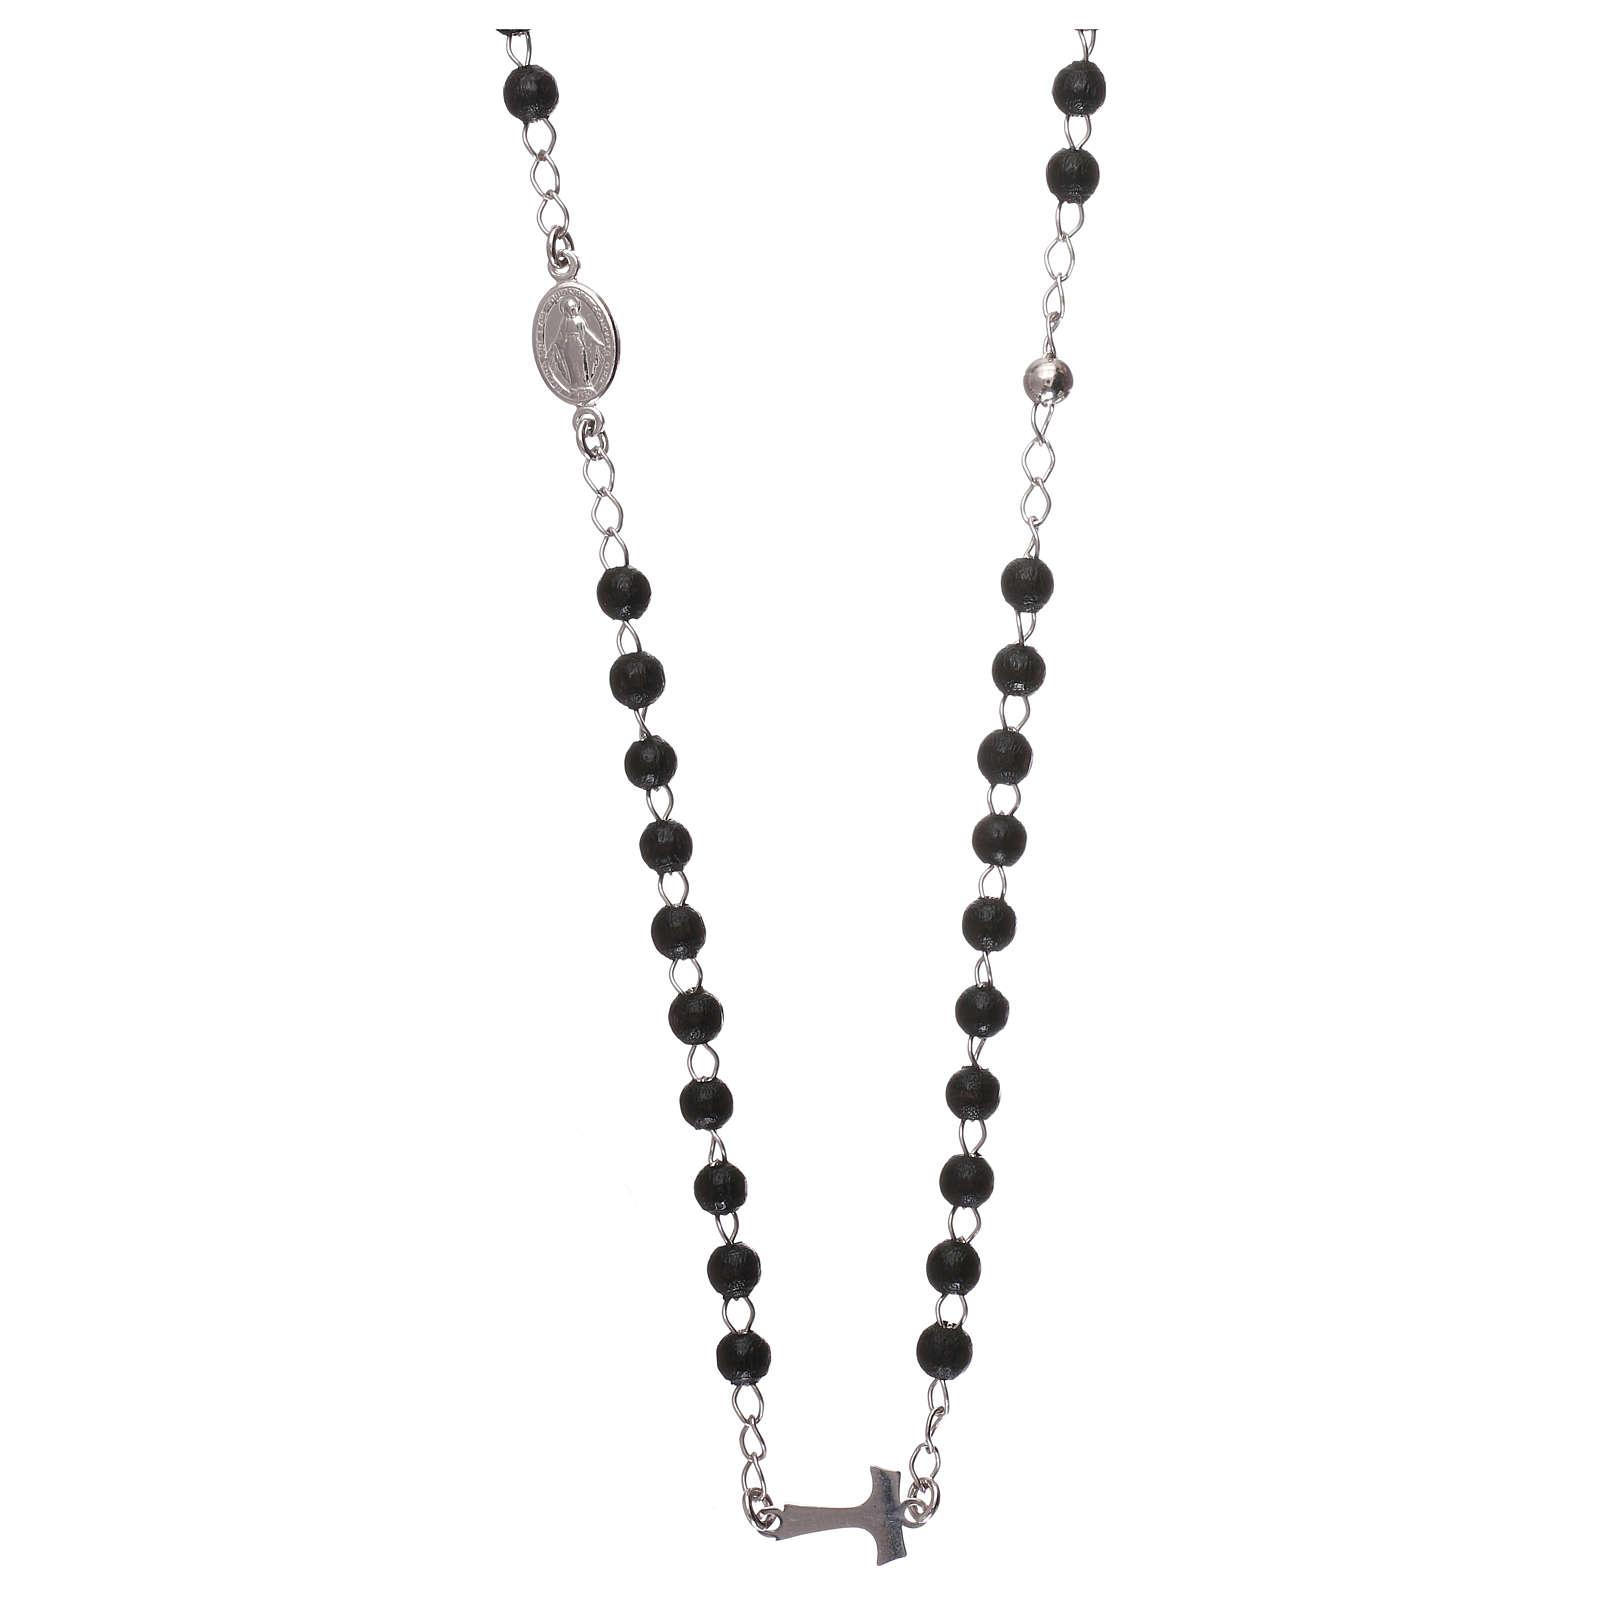 AMEN Rosary collier Tau silver 925 wood, Black 4